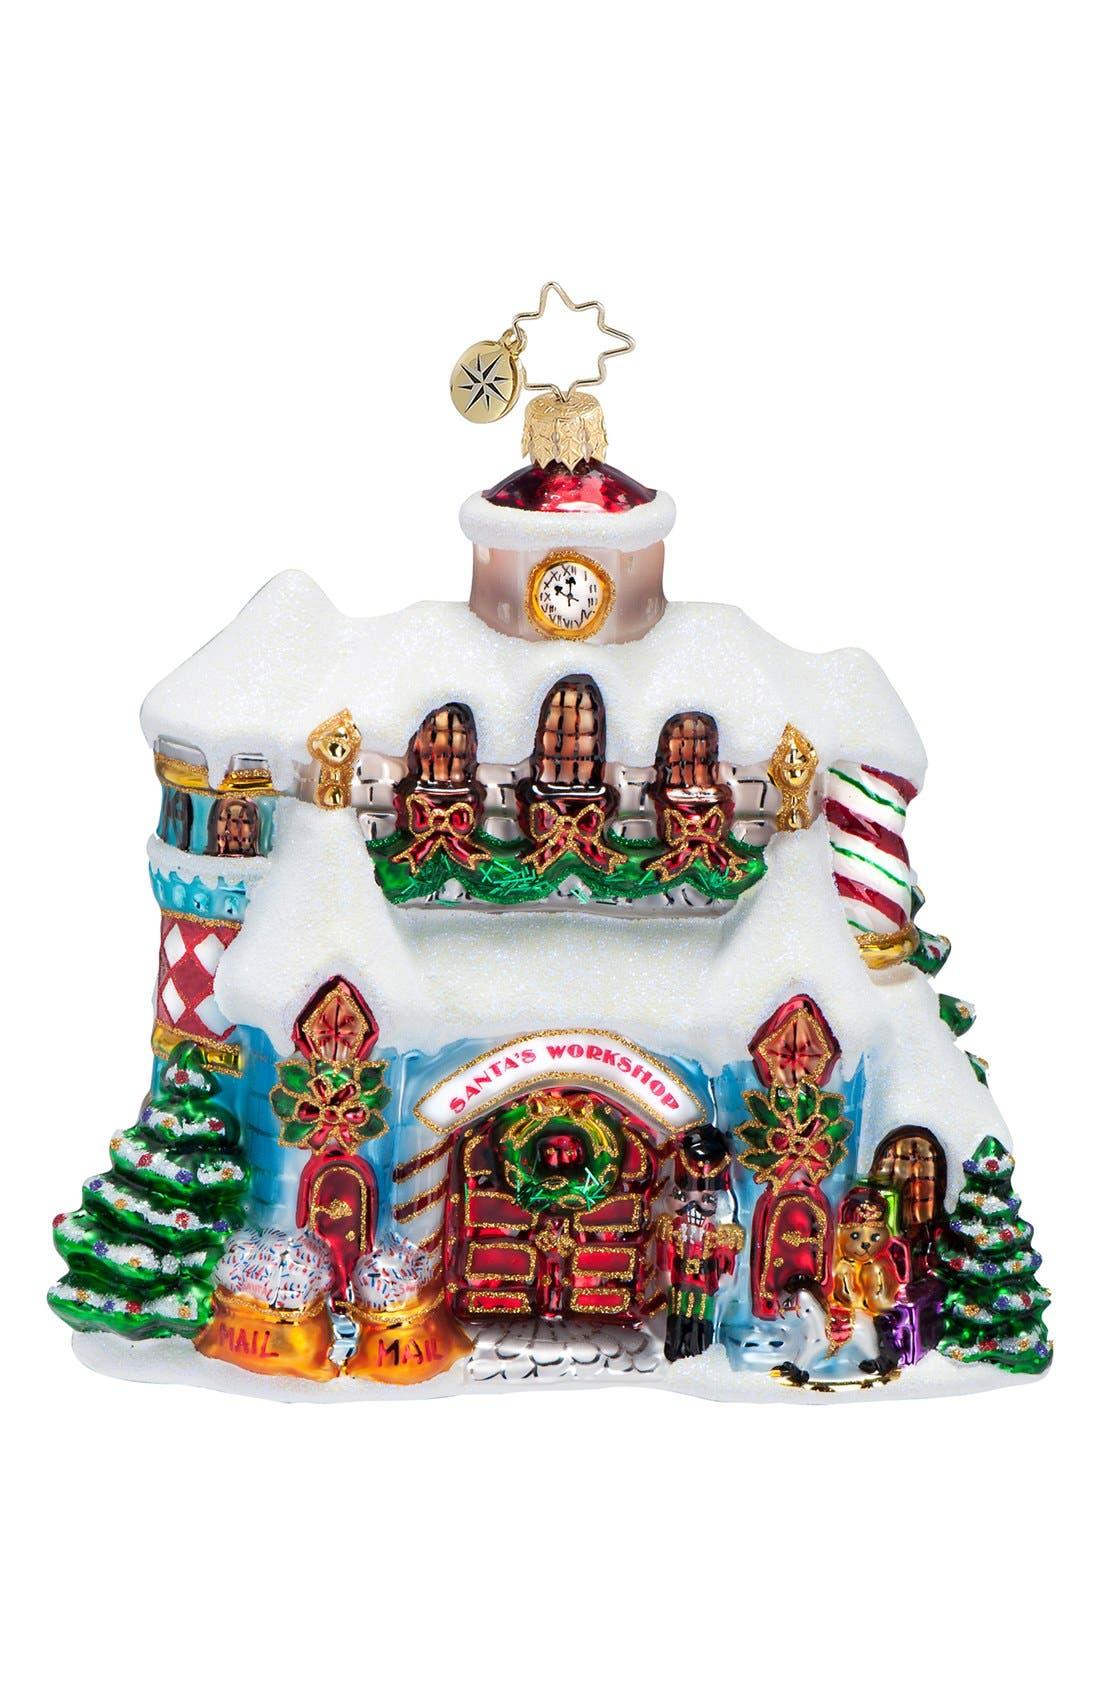 'Making Christmas Magic' Handcrafted Glass Santa's Workshop Ornament,                             Main thumbnail 1, color,                             100